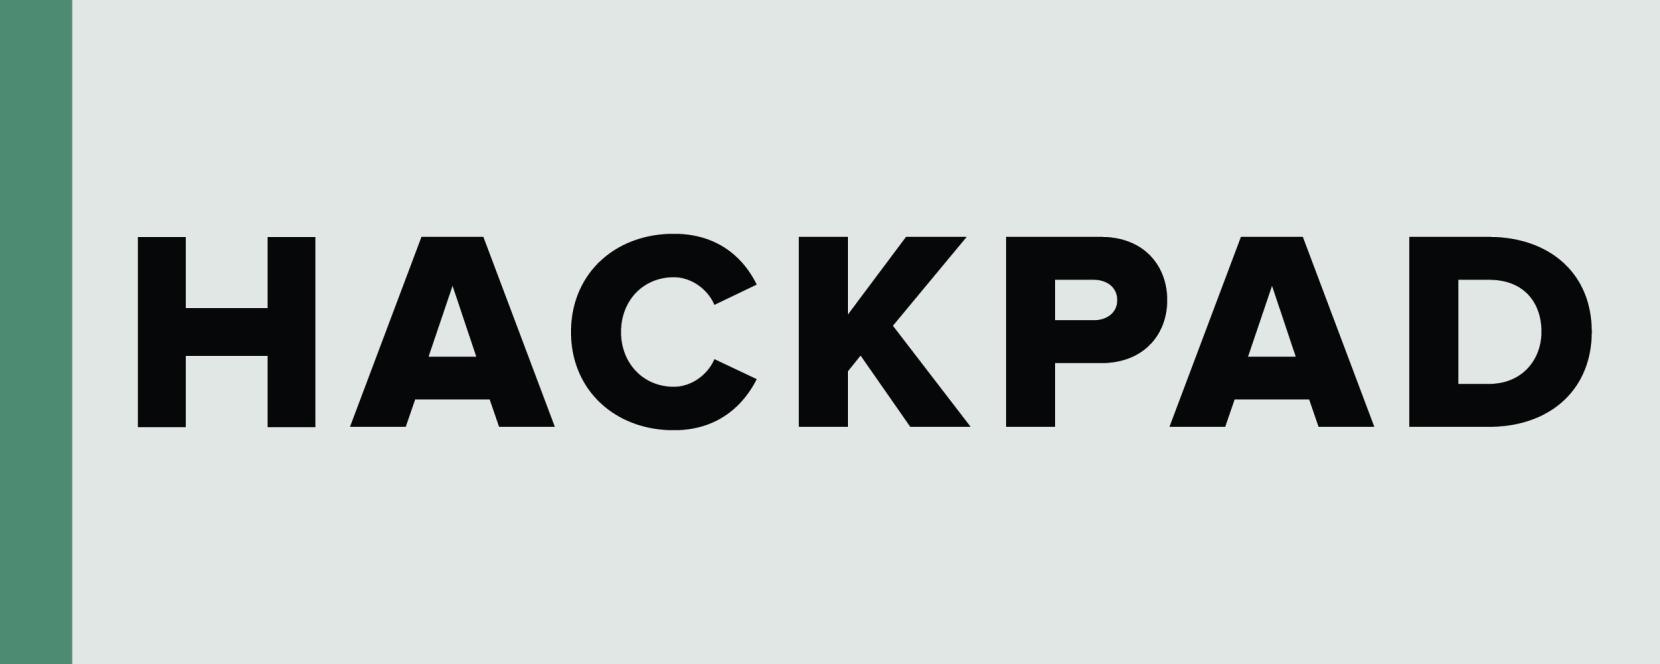 hackpad.com_CkePSoA31Yu_p.75578_1389129357266_hackpad-sticker-2x5 (2)